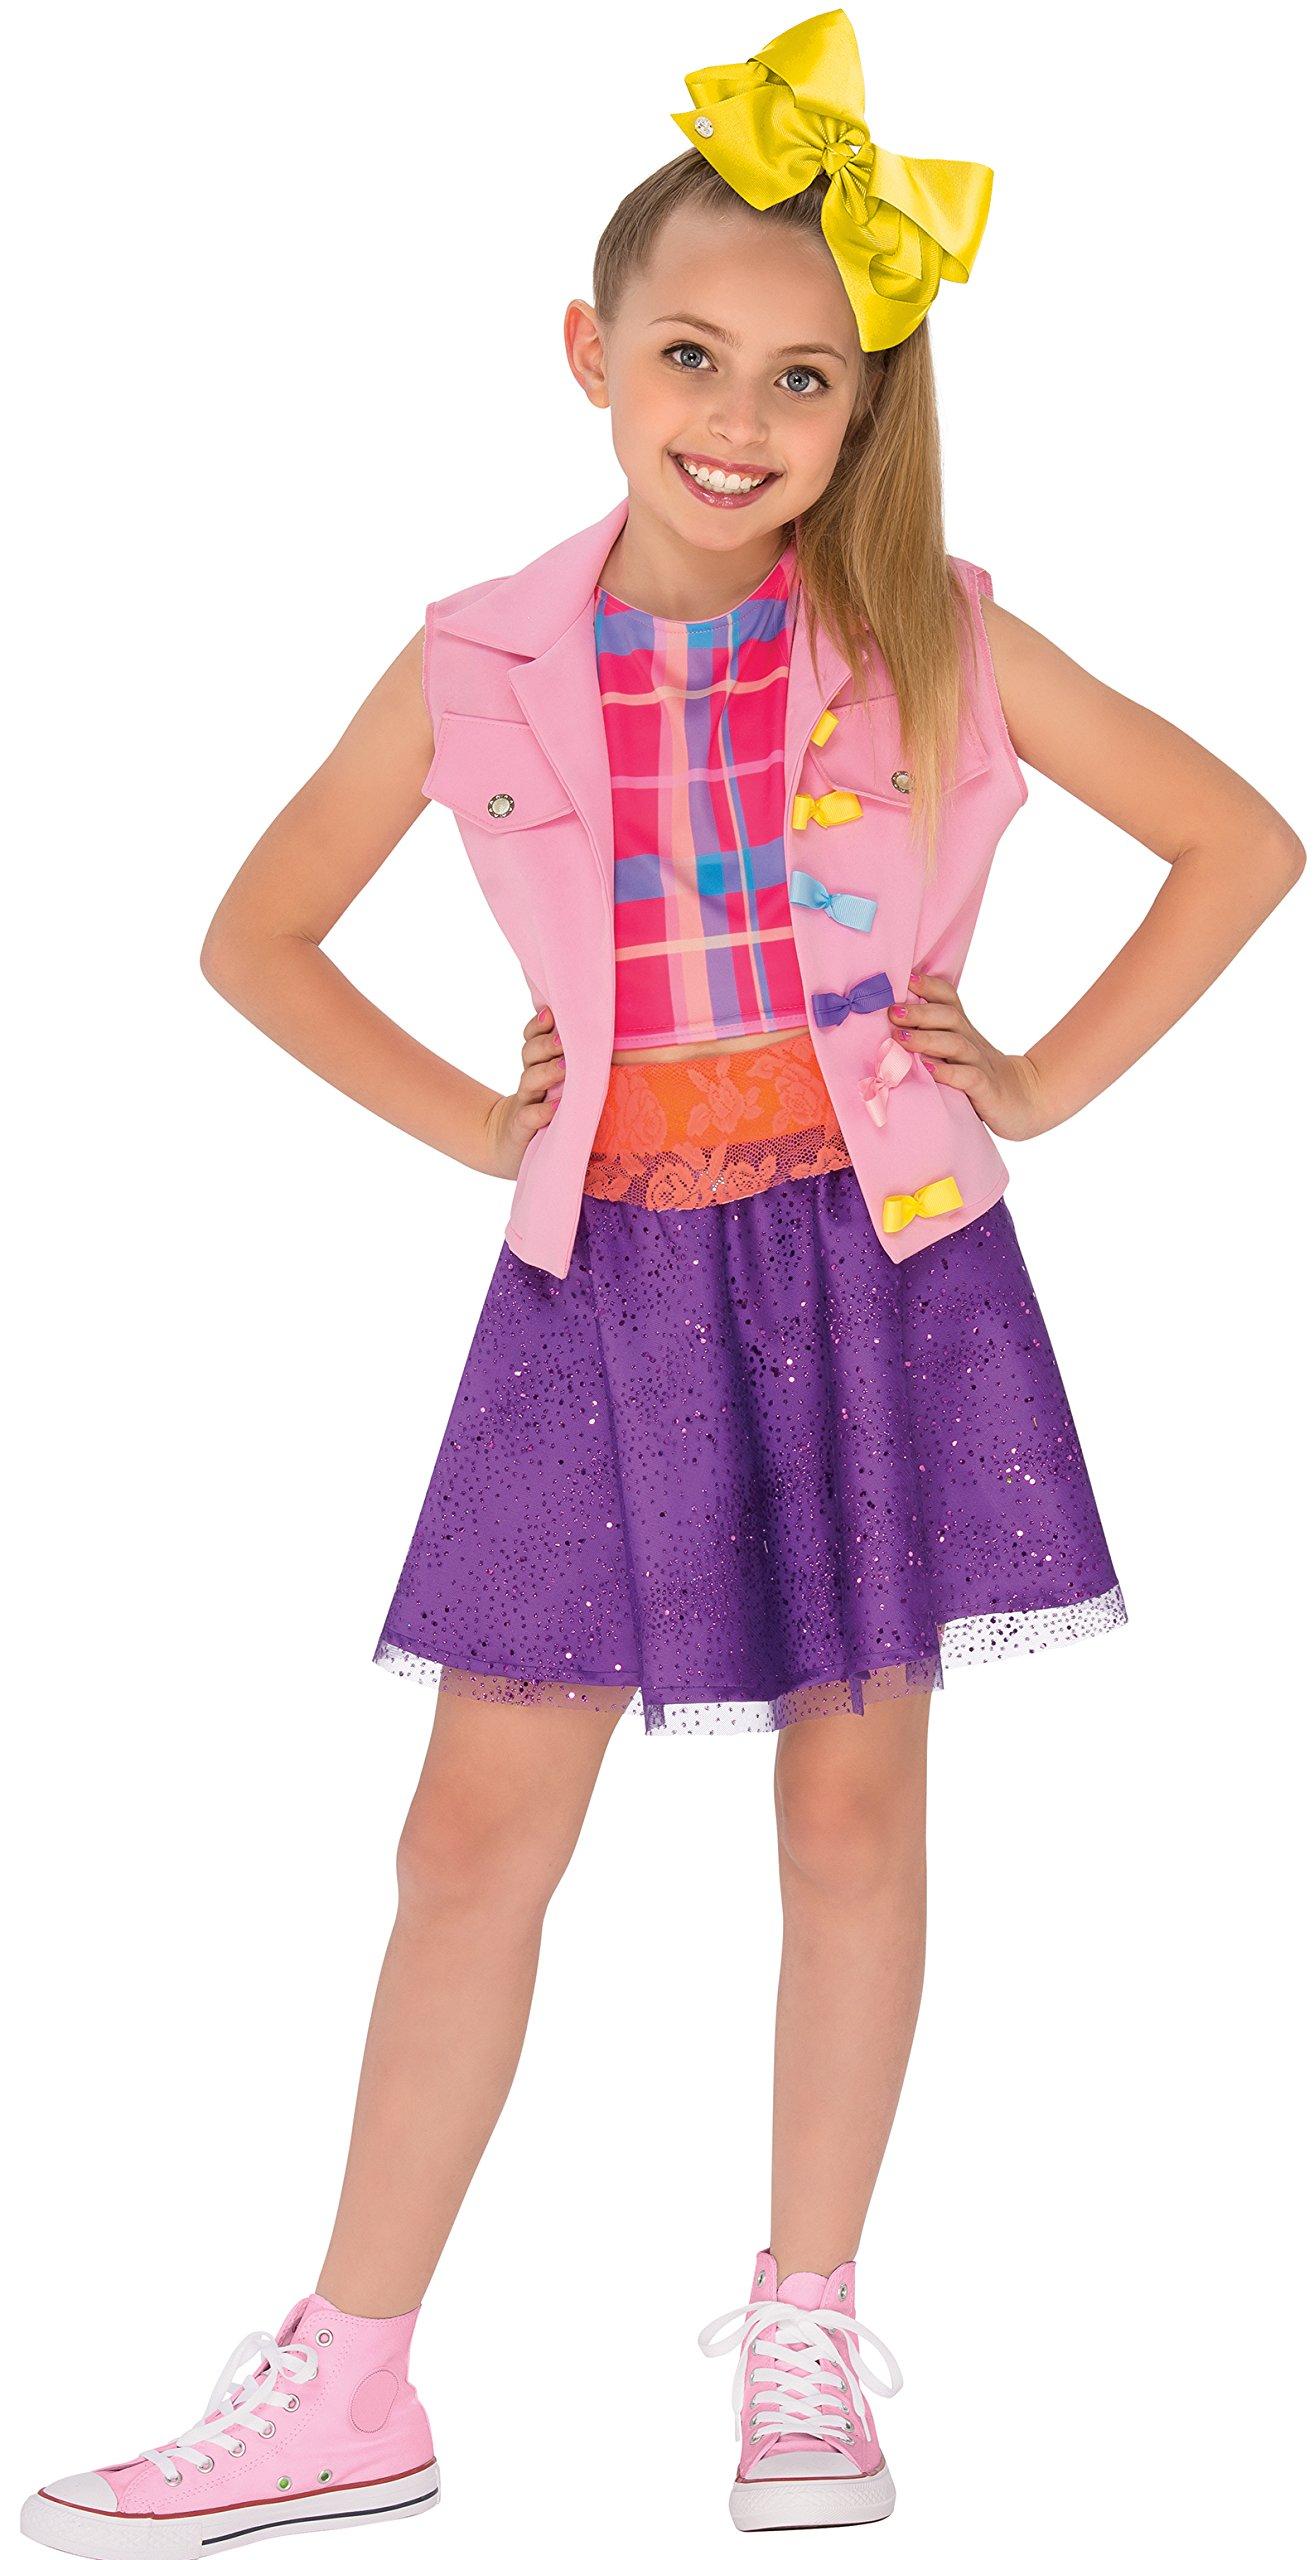 Rubies 640736_M Jojo Siwa Boomerang Music Video Outfit Costume, Multicolor, Medium